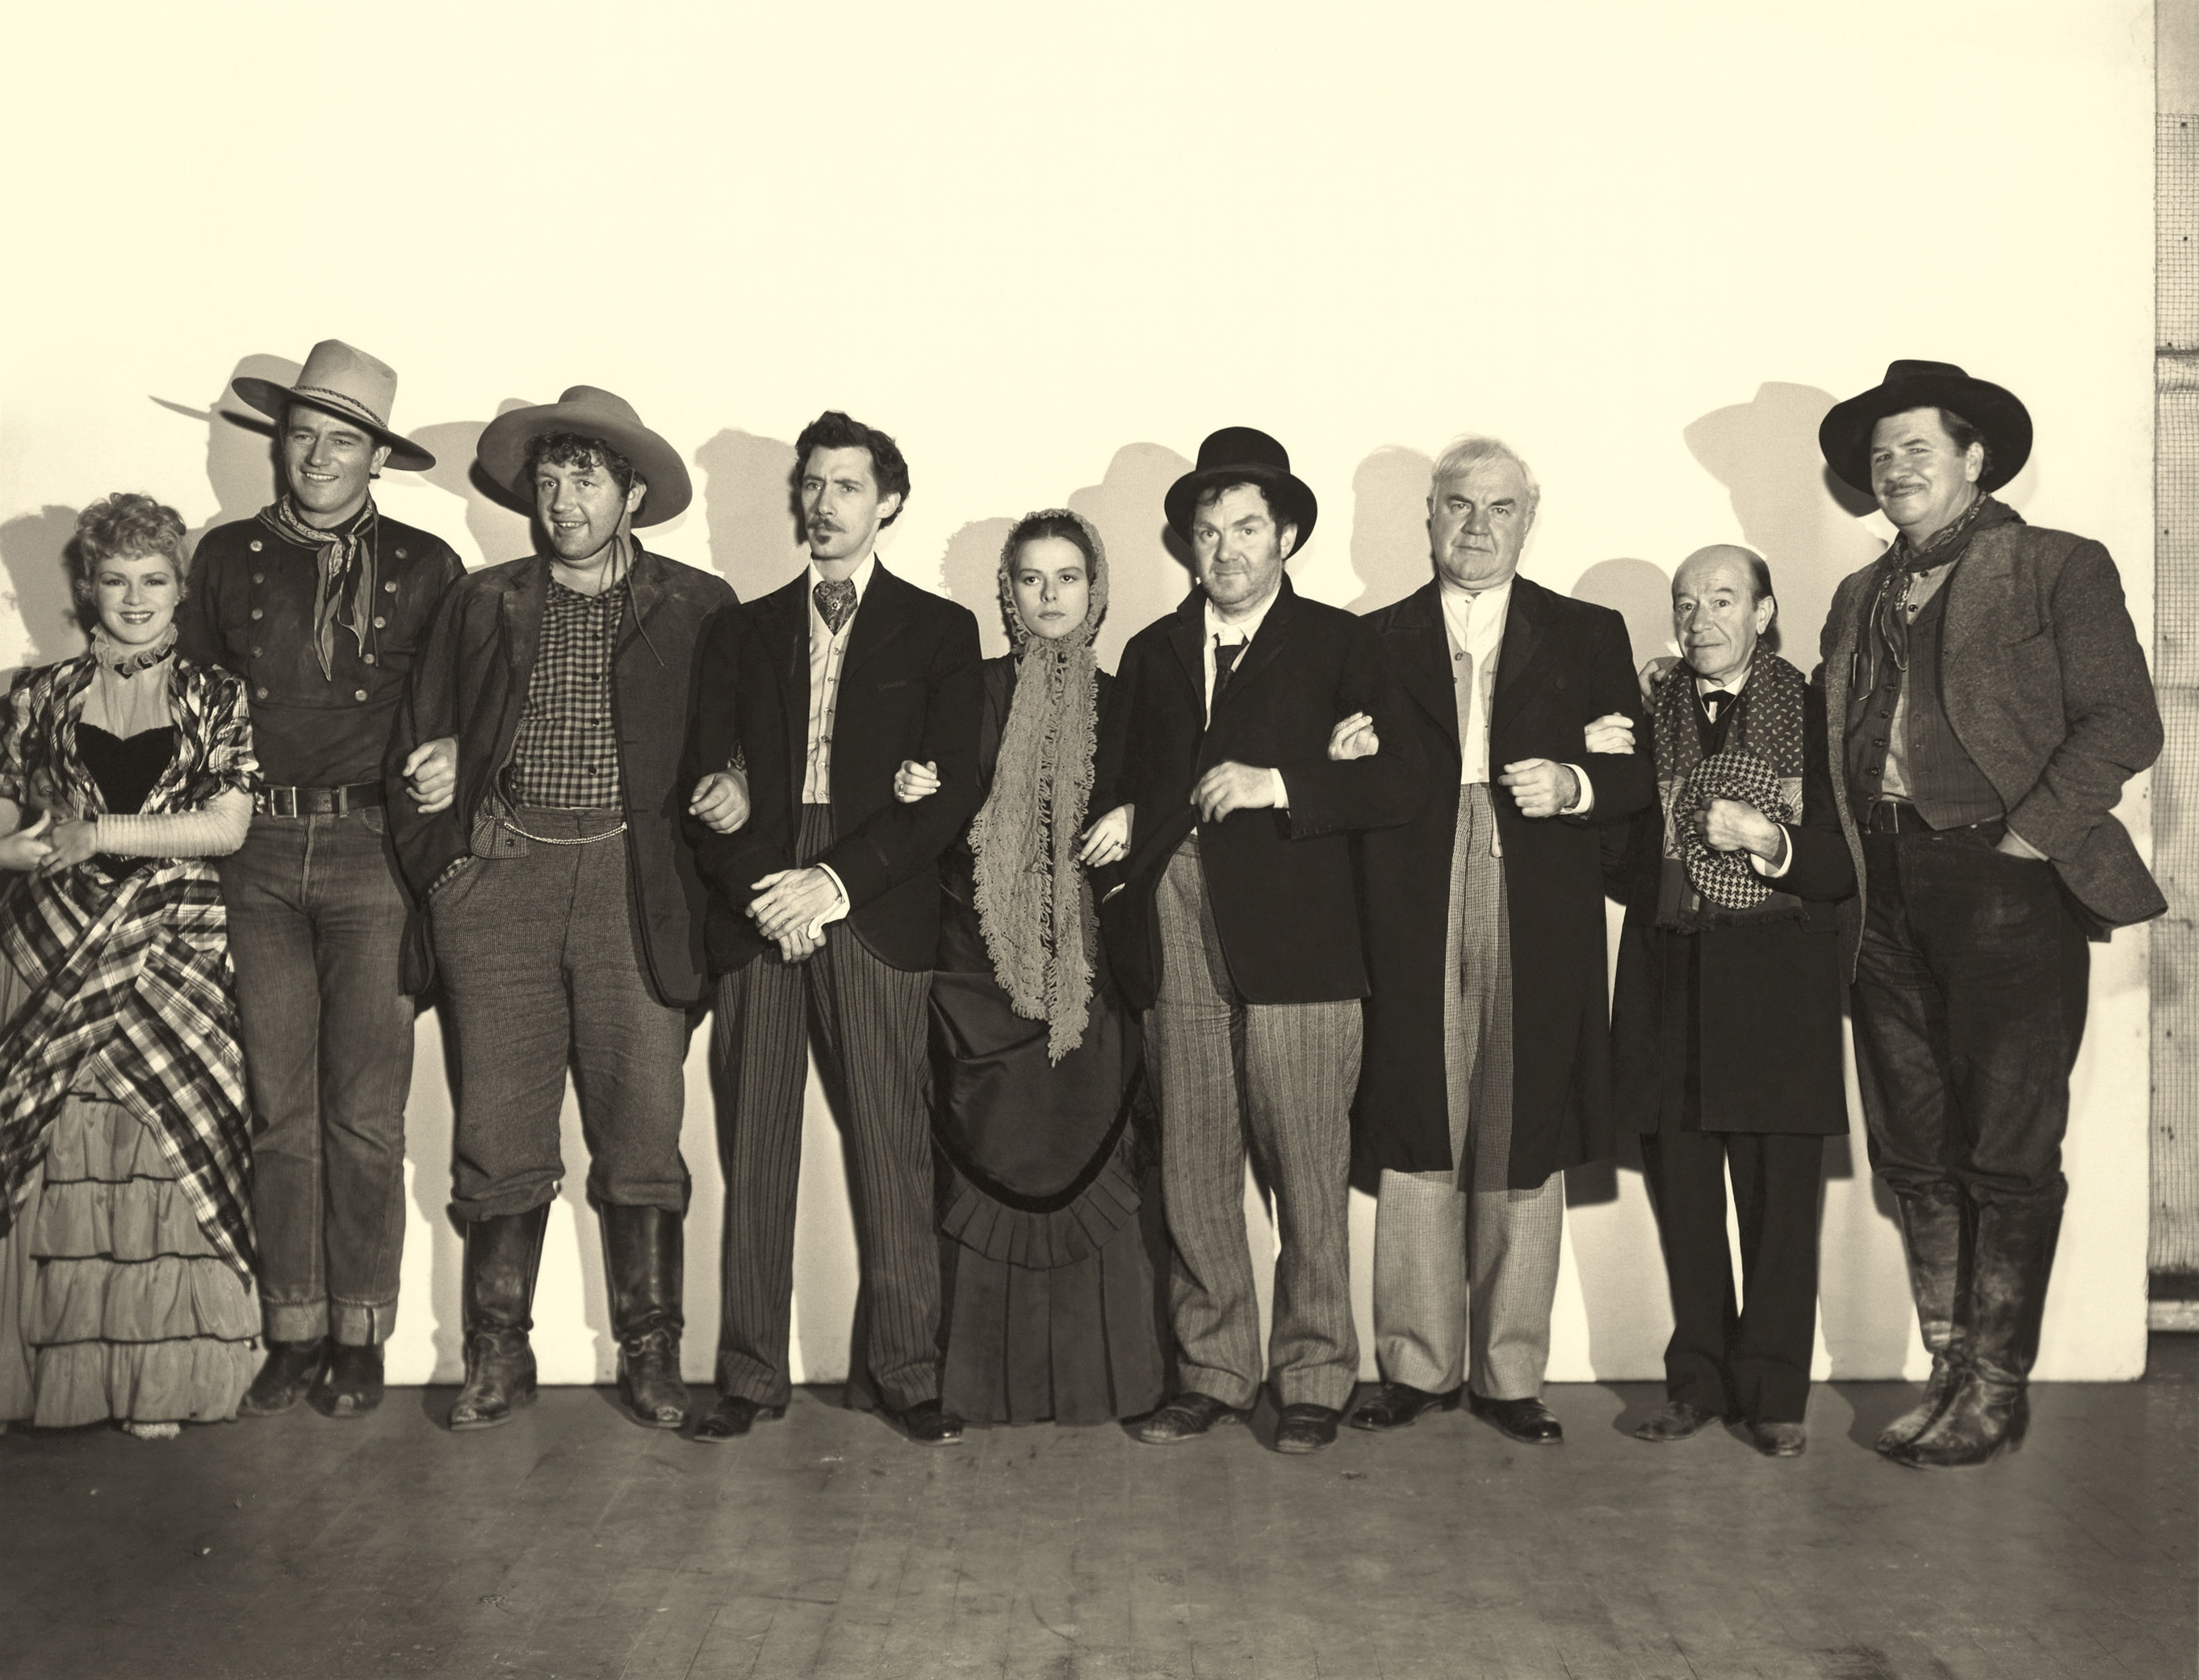 (L to R)  Claire Trevor, John Wayne, Andy Devine, John Carradine, Louise Platt, Thomas Mitchell, Berton Churchill, Donald Meek, George Bancroft